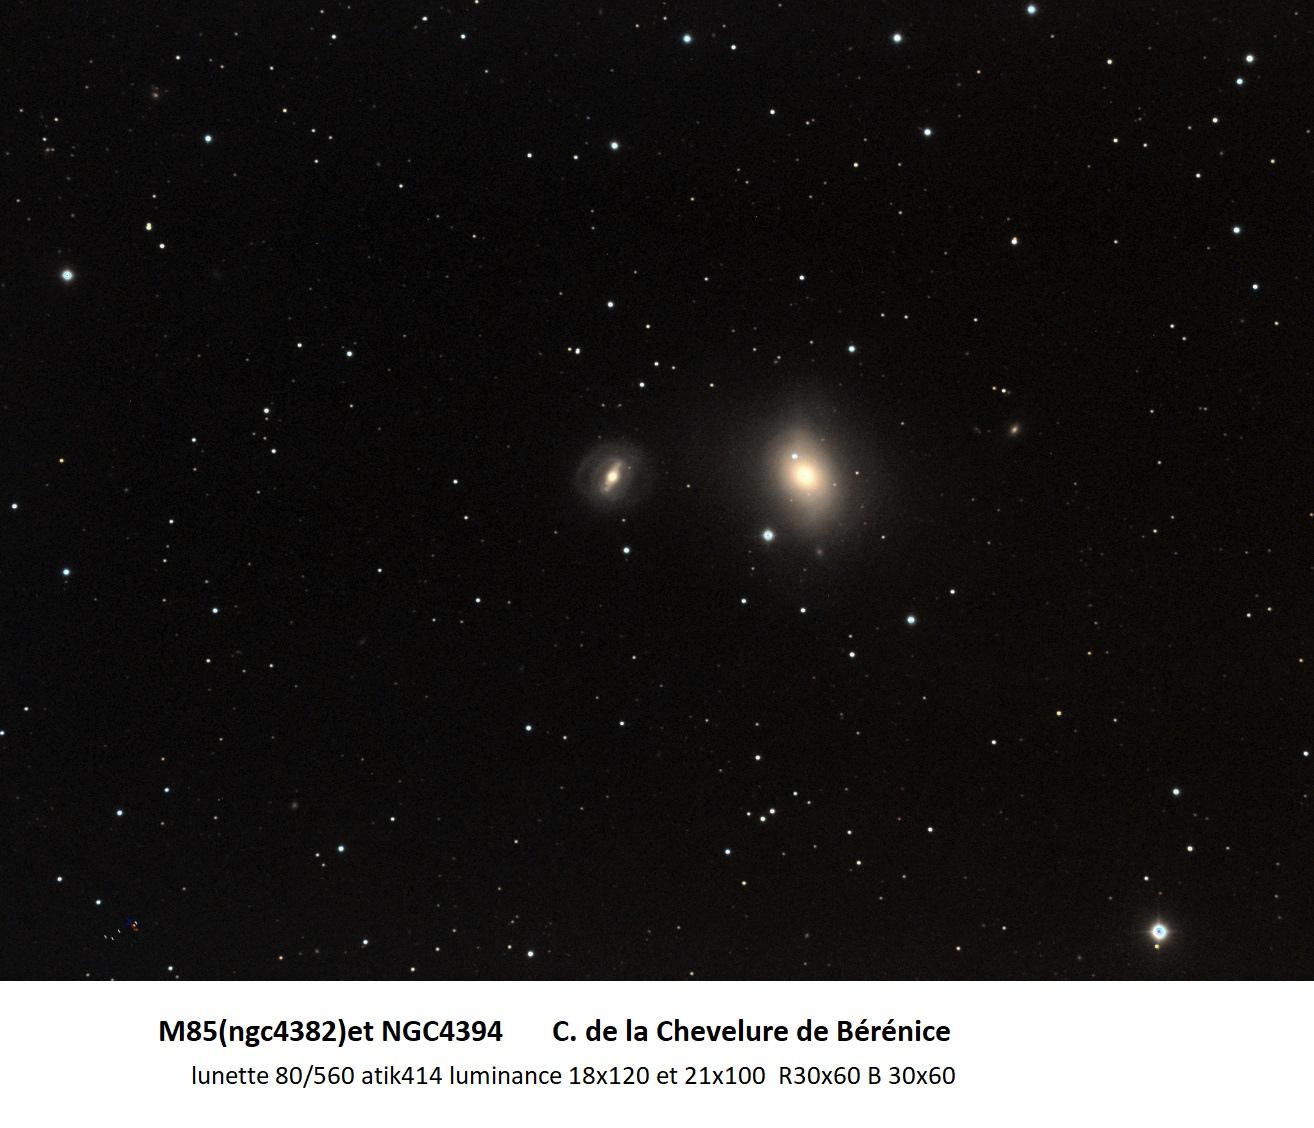 M85.jpg.0cf8001c045c62c92eea0160dbac6ee5.jpg